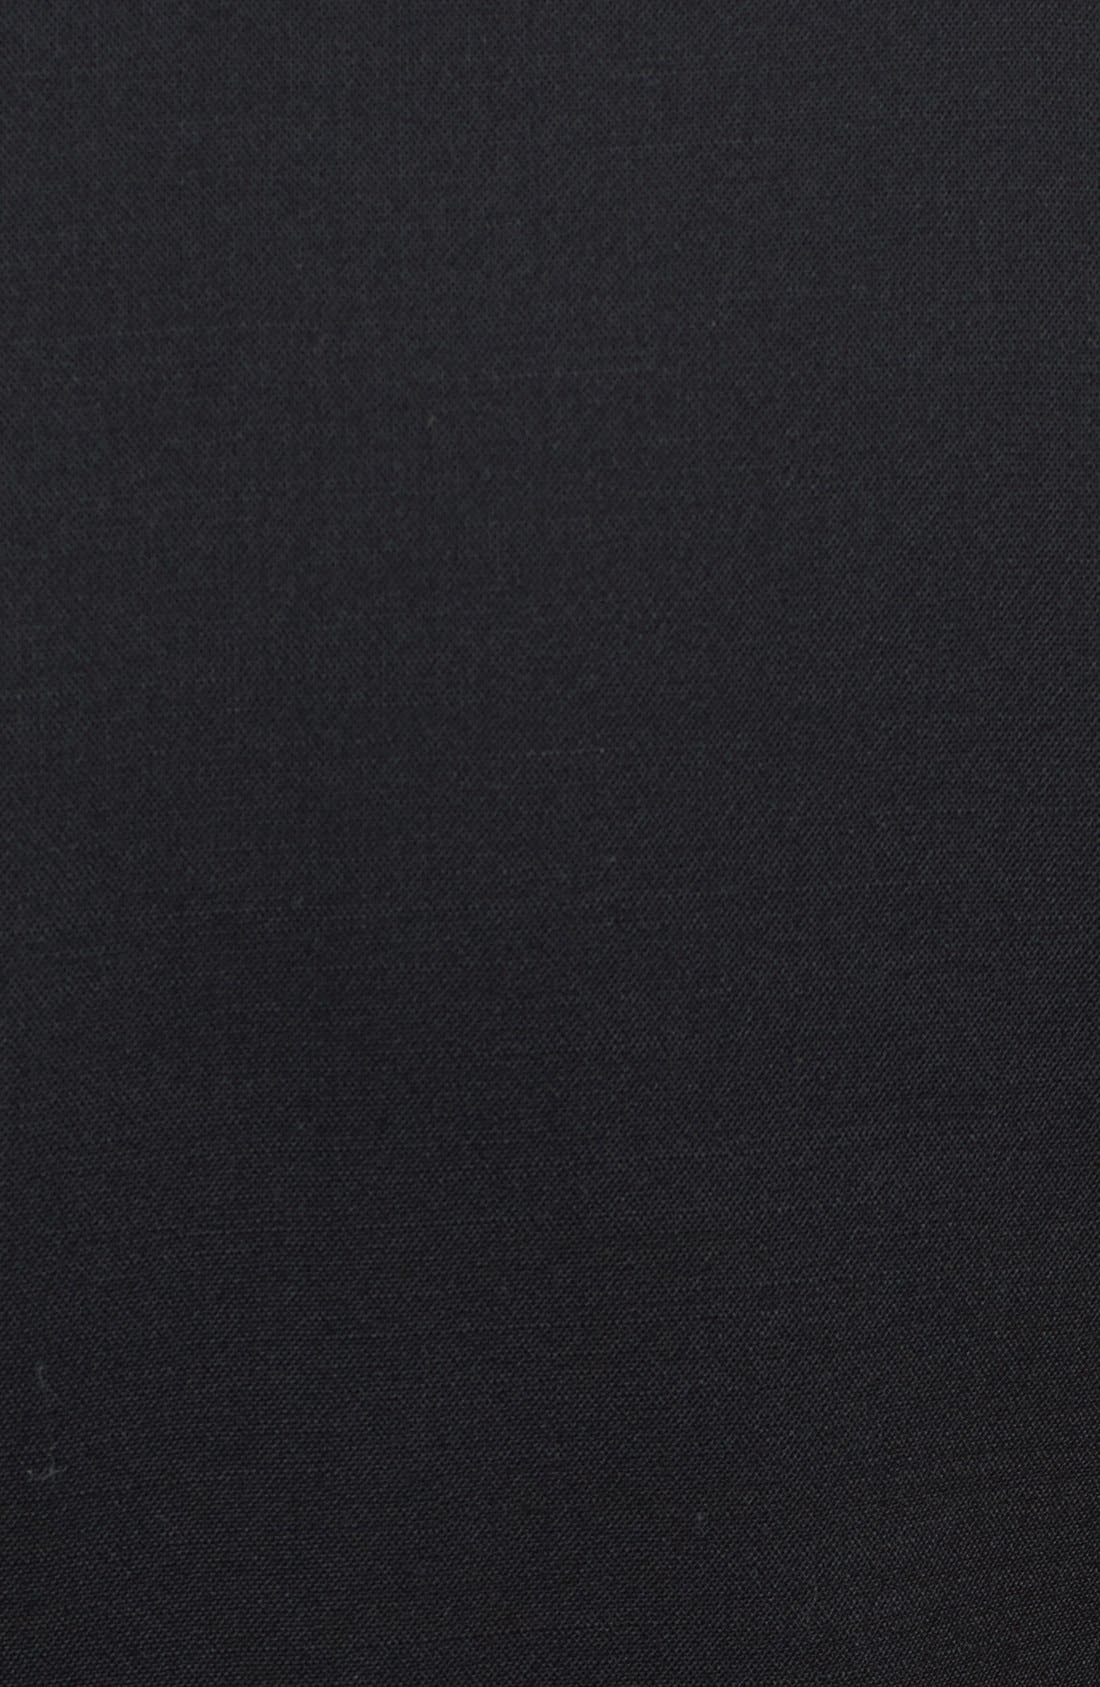 Alternate Image 3  - Max Mara 'Fiamma' Wool Crepe Dress